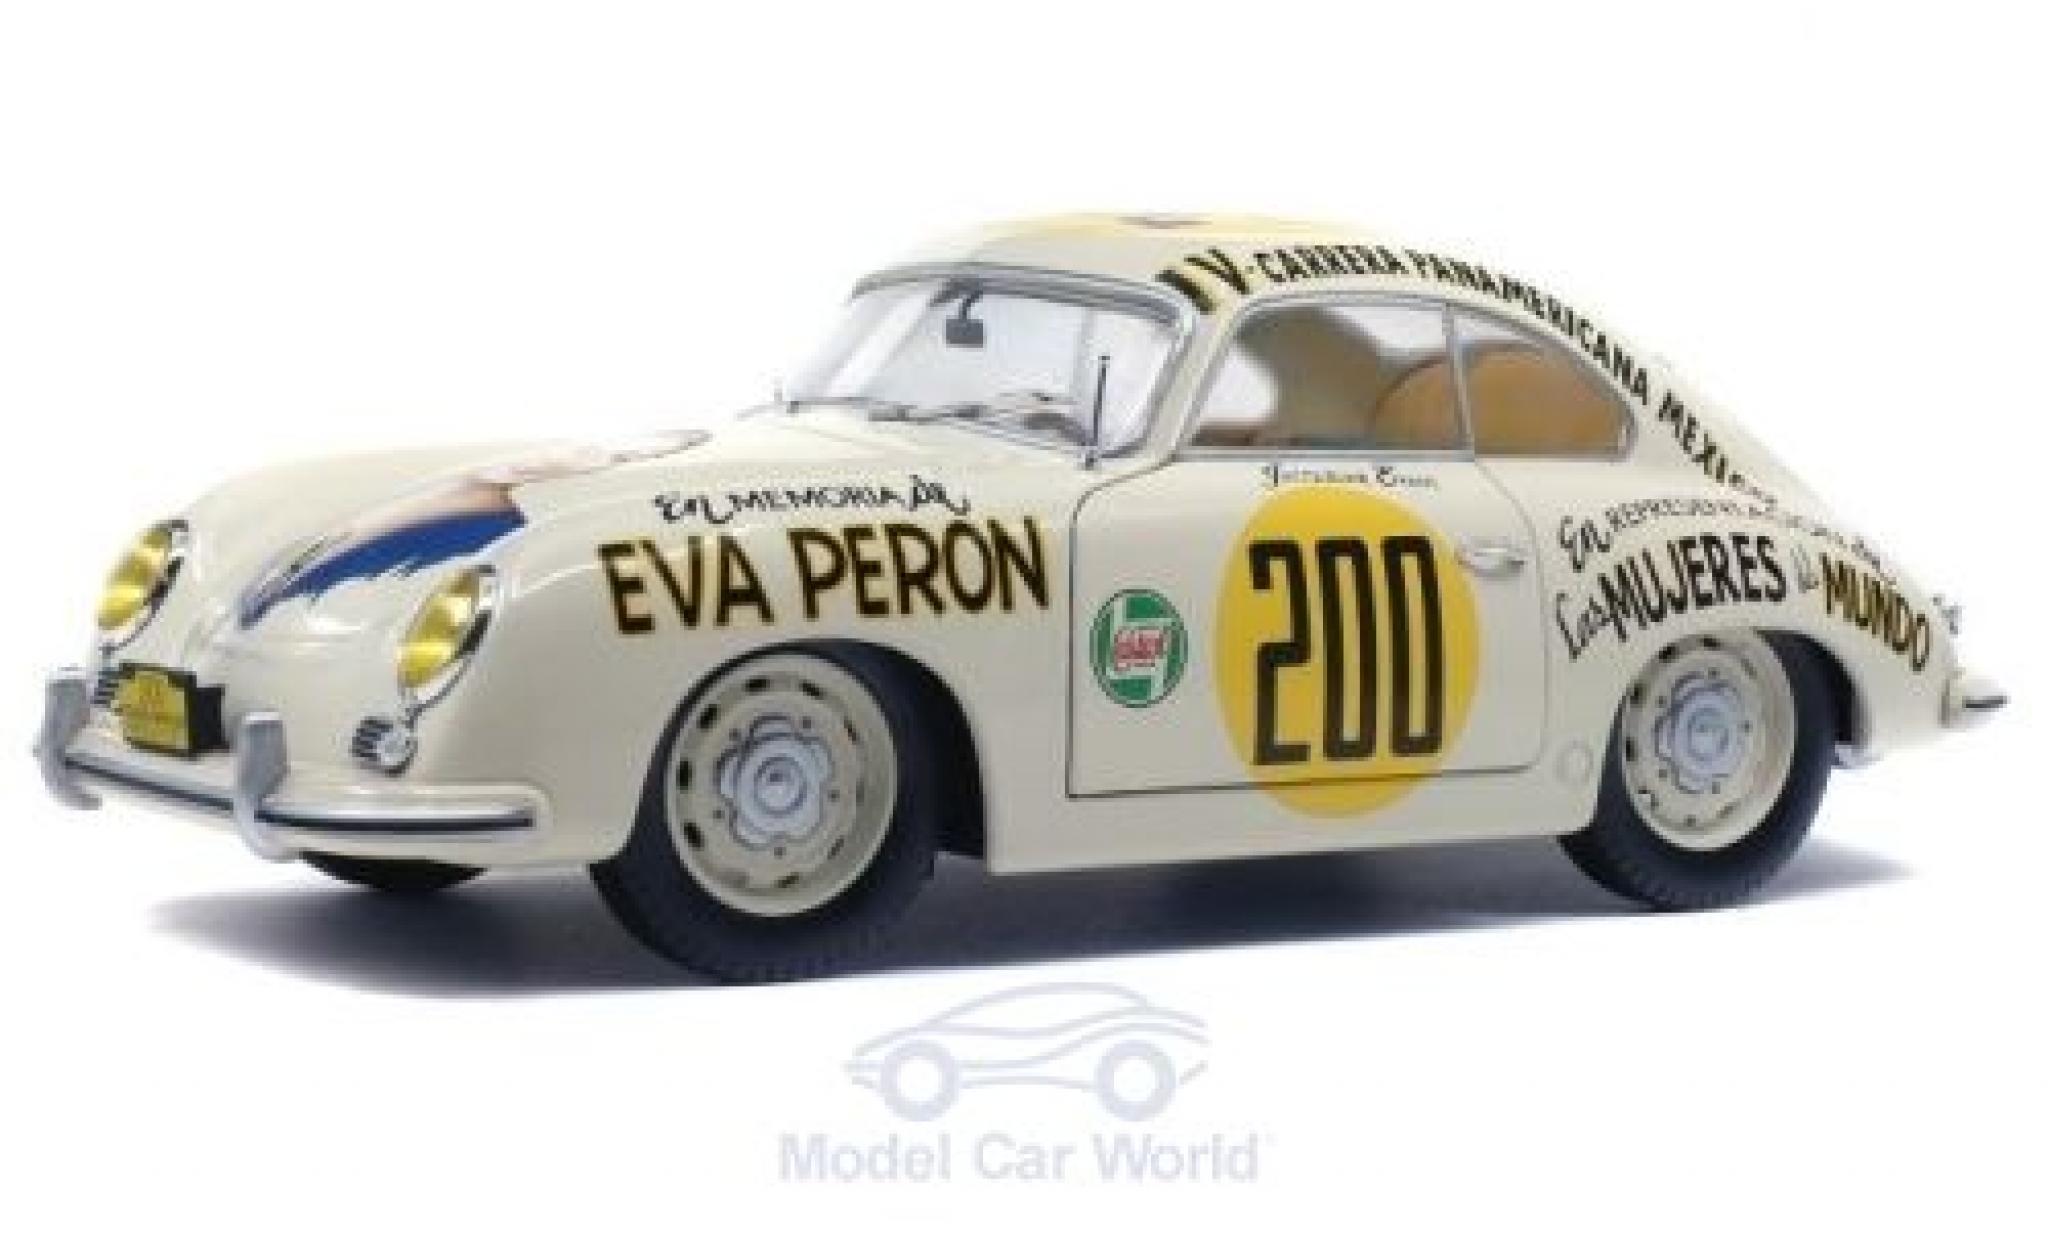 Porsche 356 1/18 Solido Pre-A No.200 Eva Peron Carrera Panamericana 1953 J.Evans